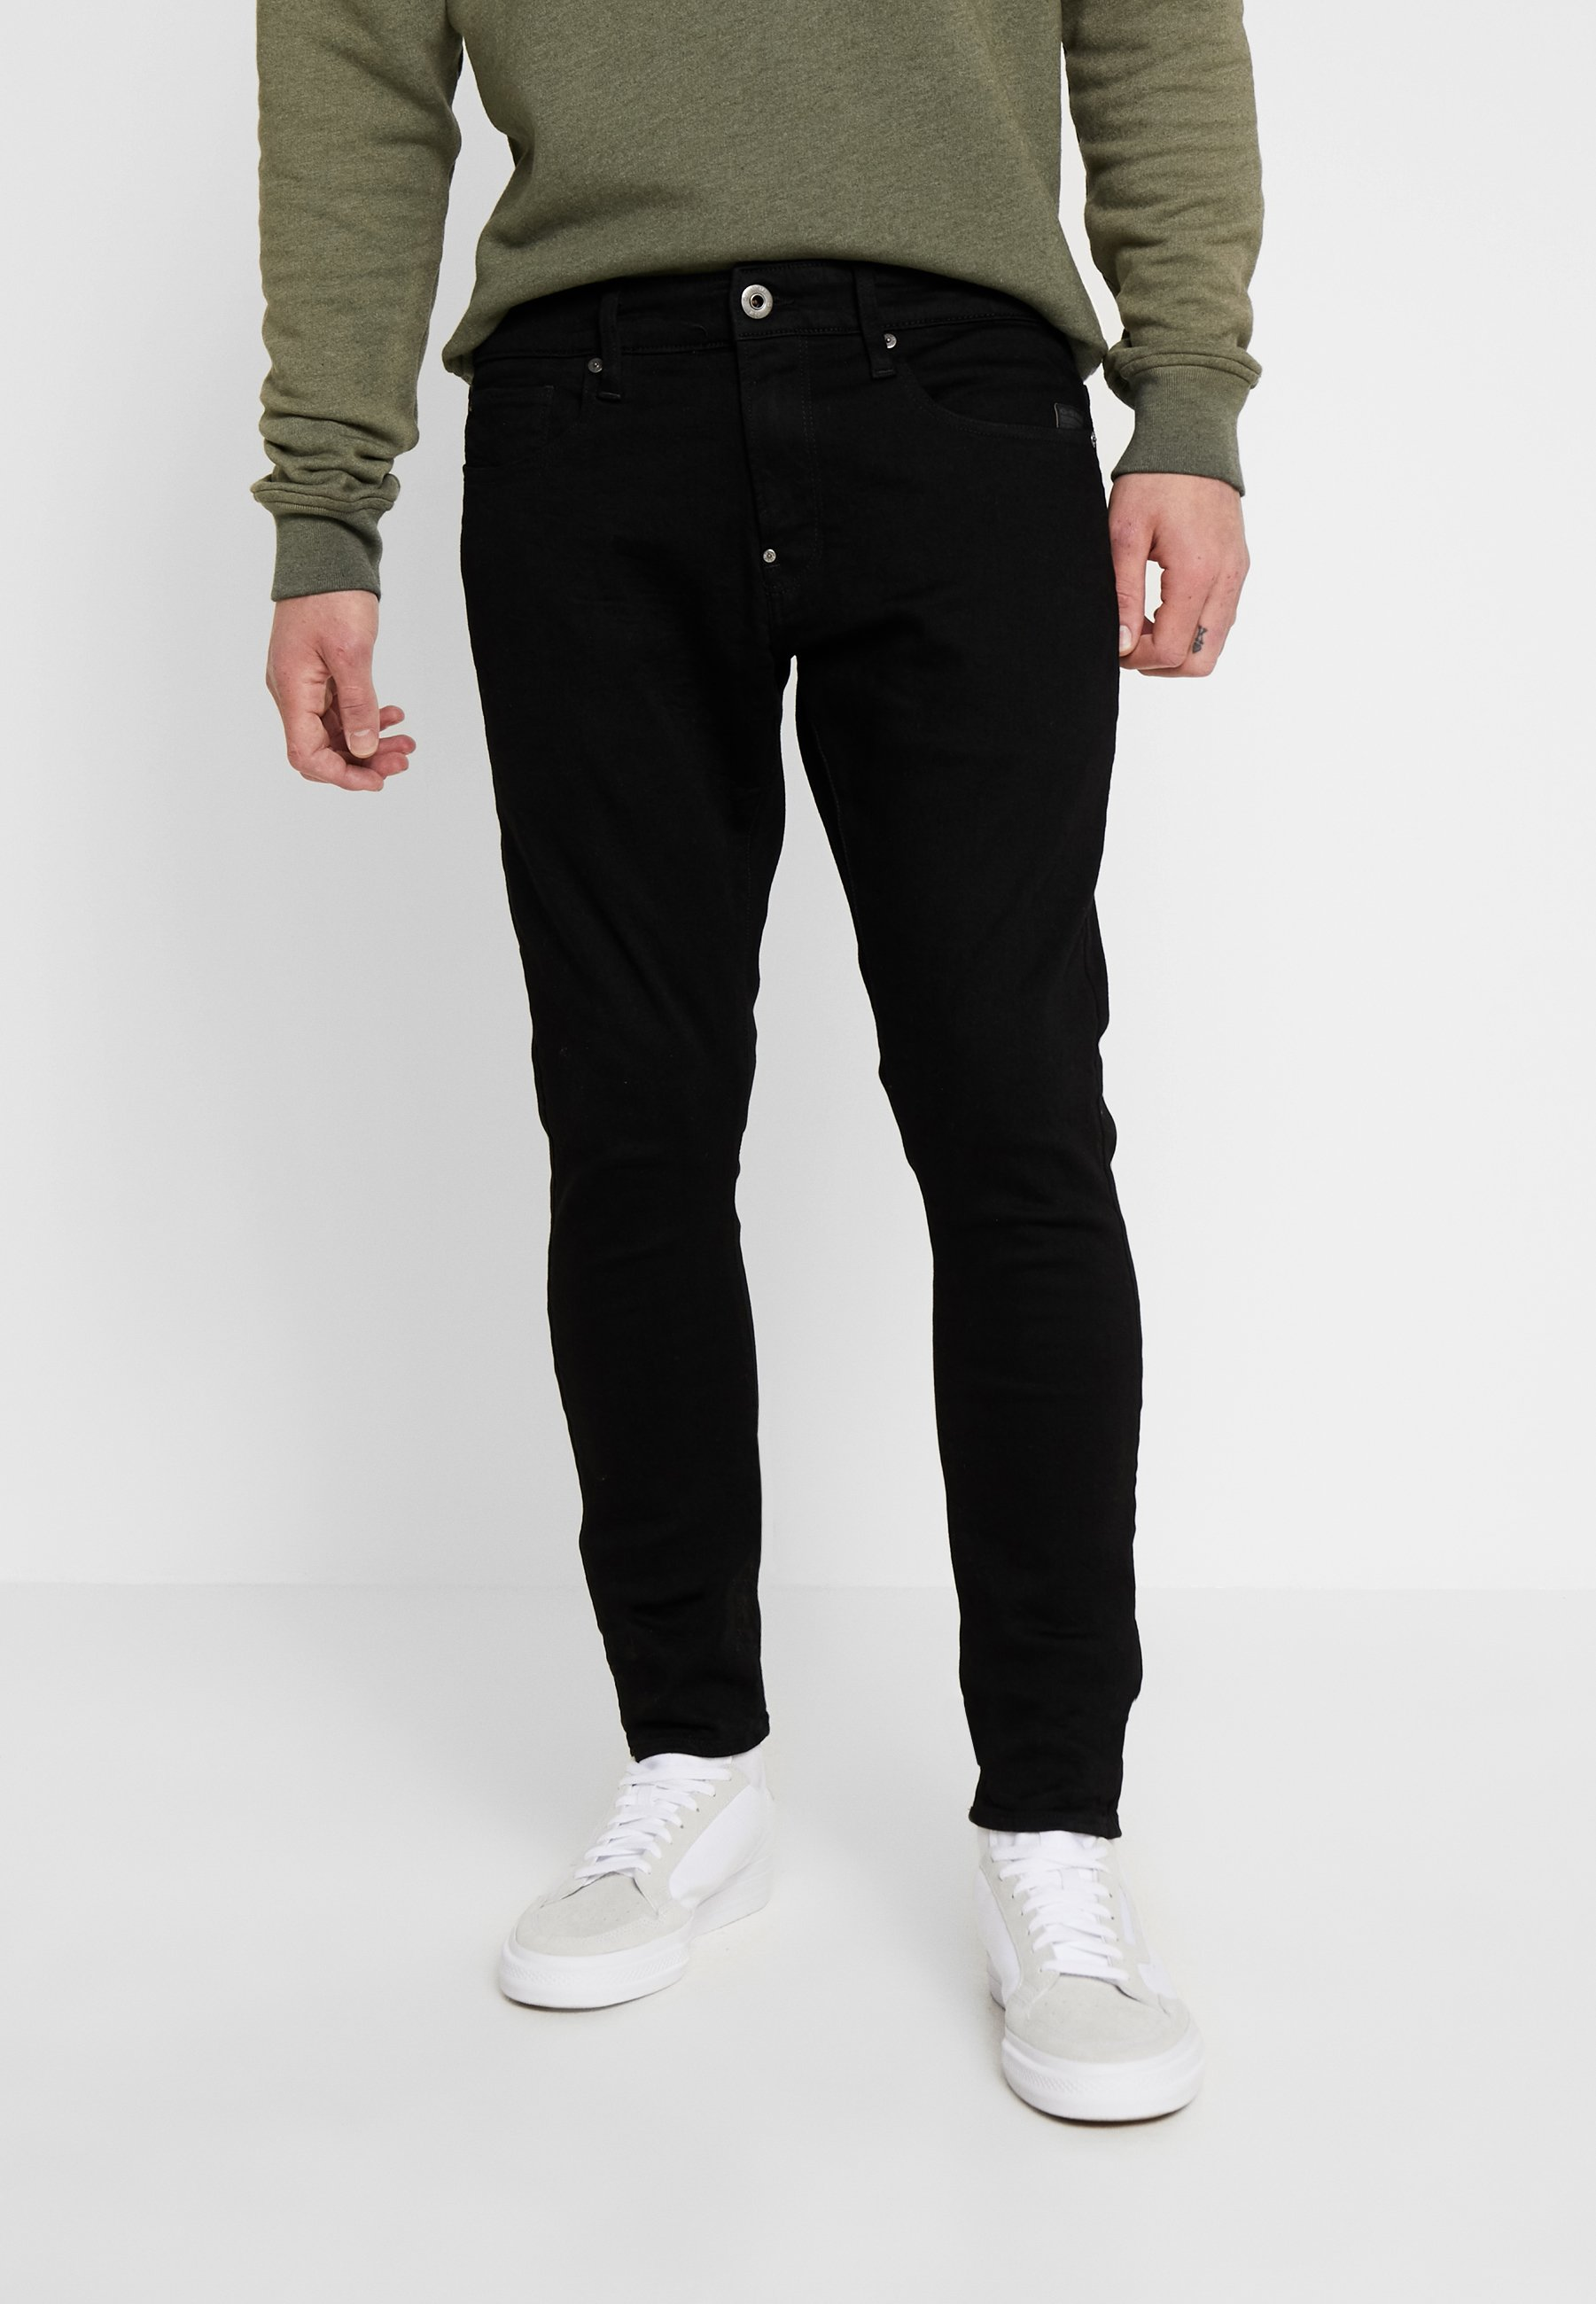 G Revend FitJeans star Skinny Nero Black hdQrCxtsB